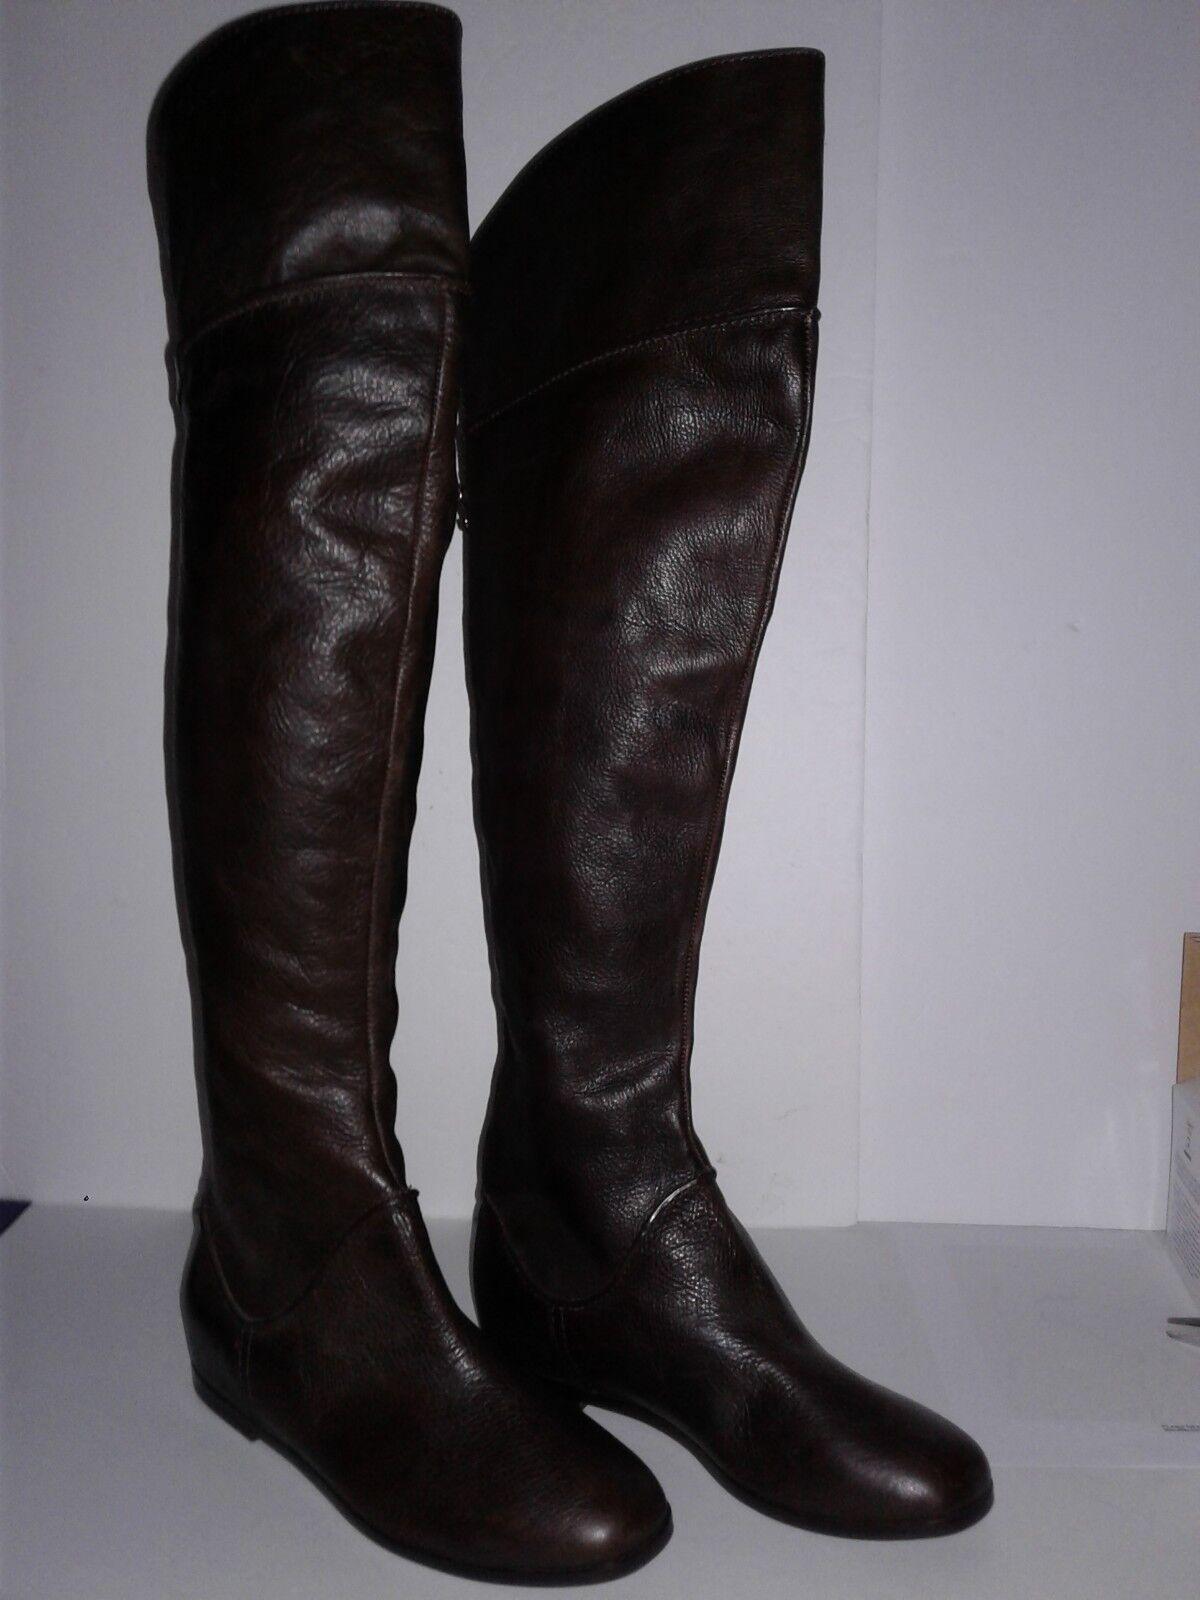 Via Spiga 'Georgia' Over the Knee Boot- Braun - Größe 6 M   (A2)